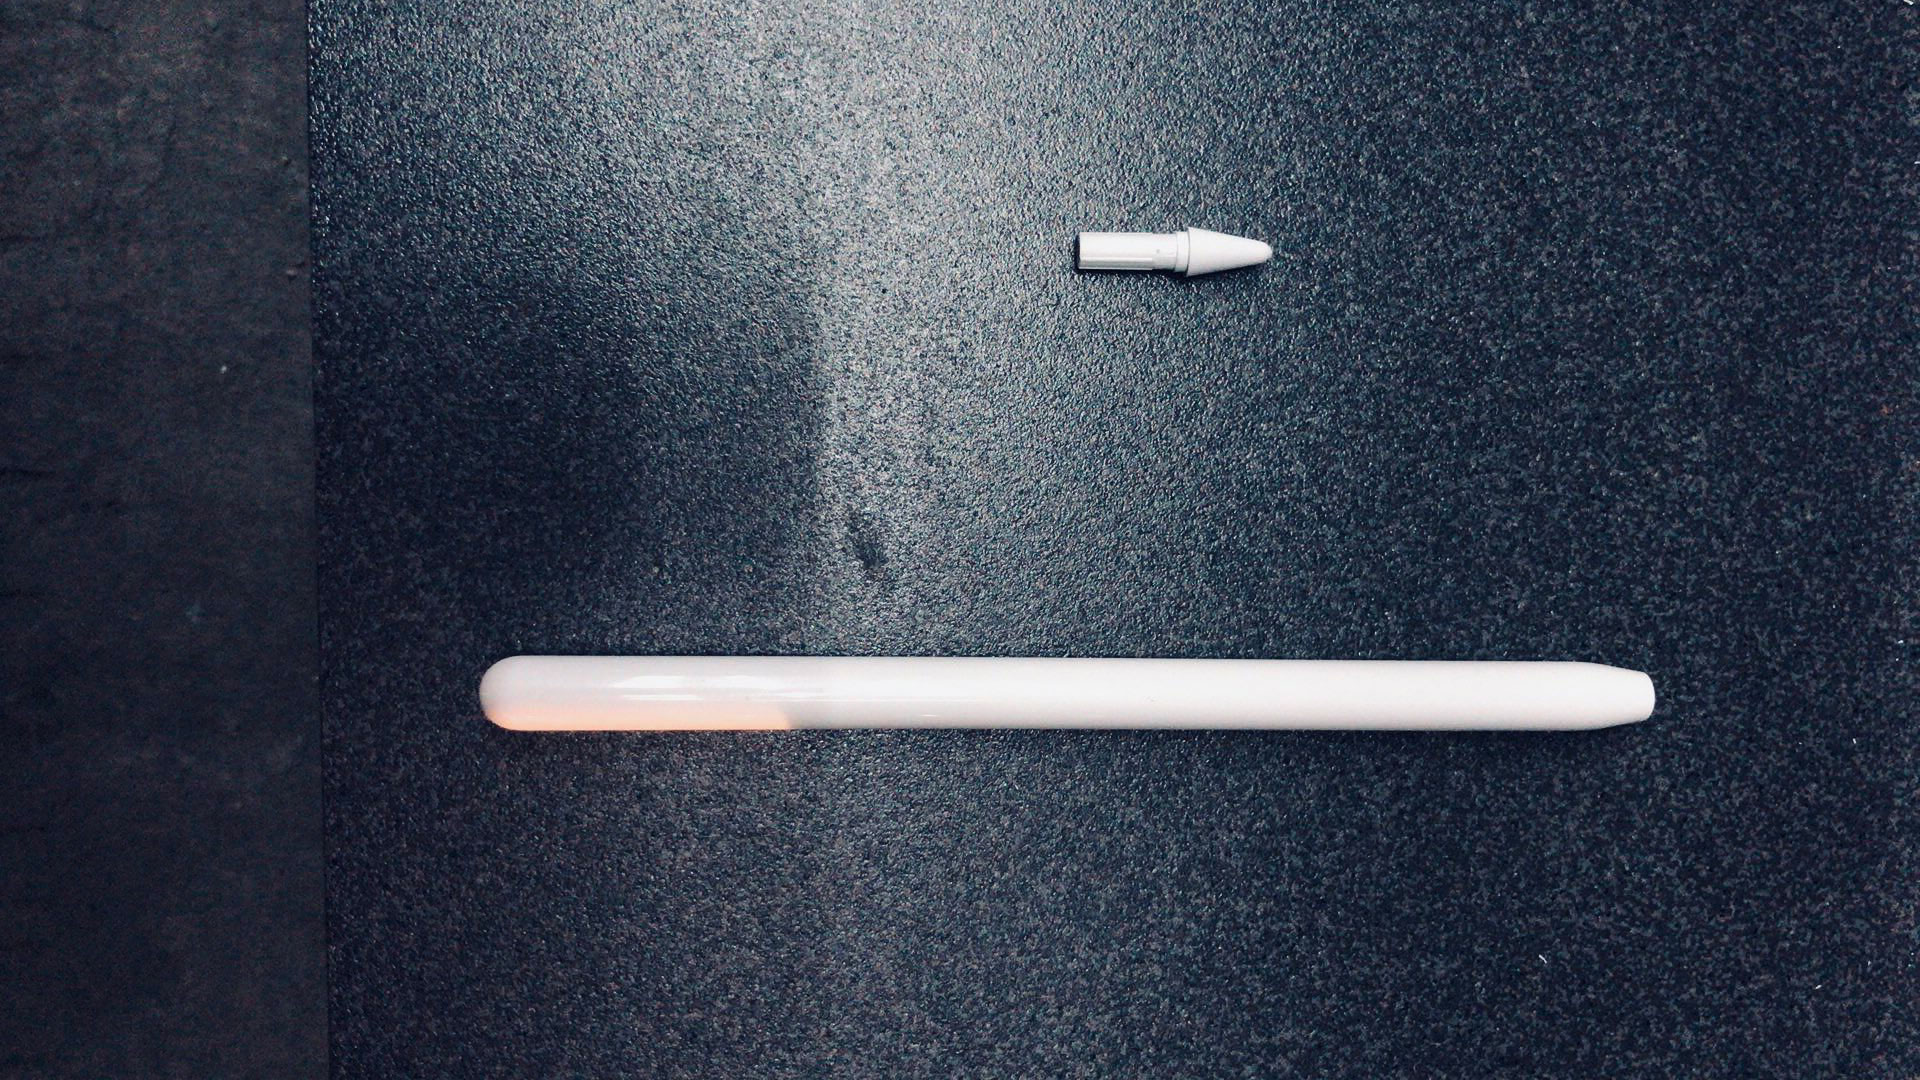 Apple Pencil leak